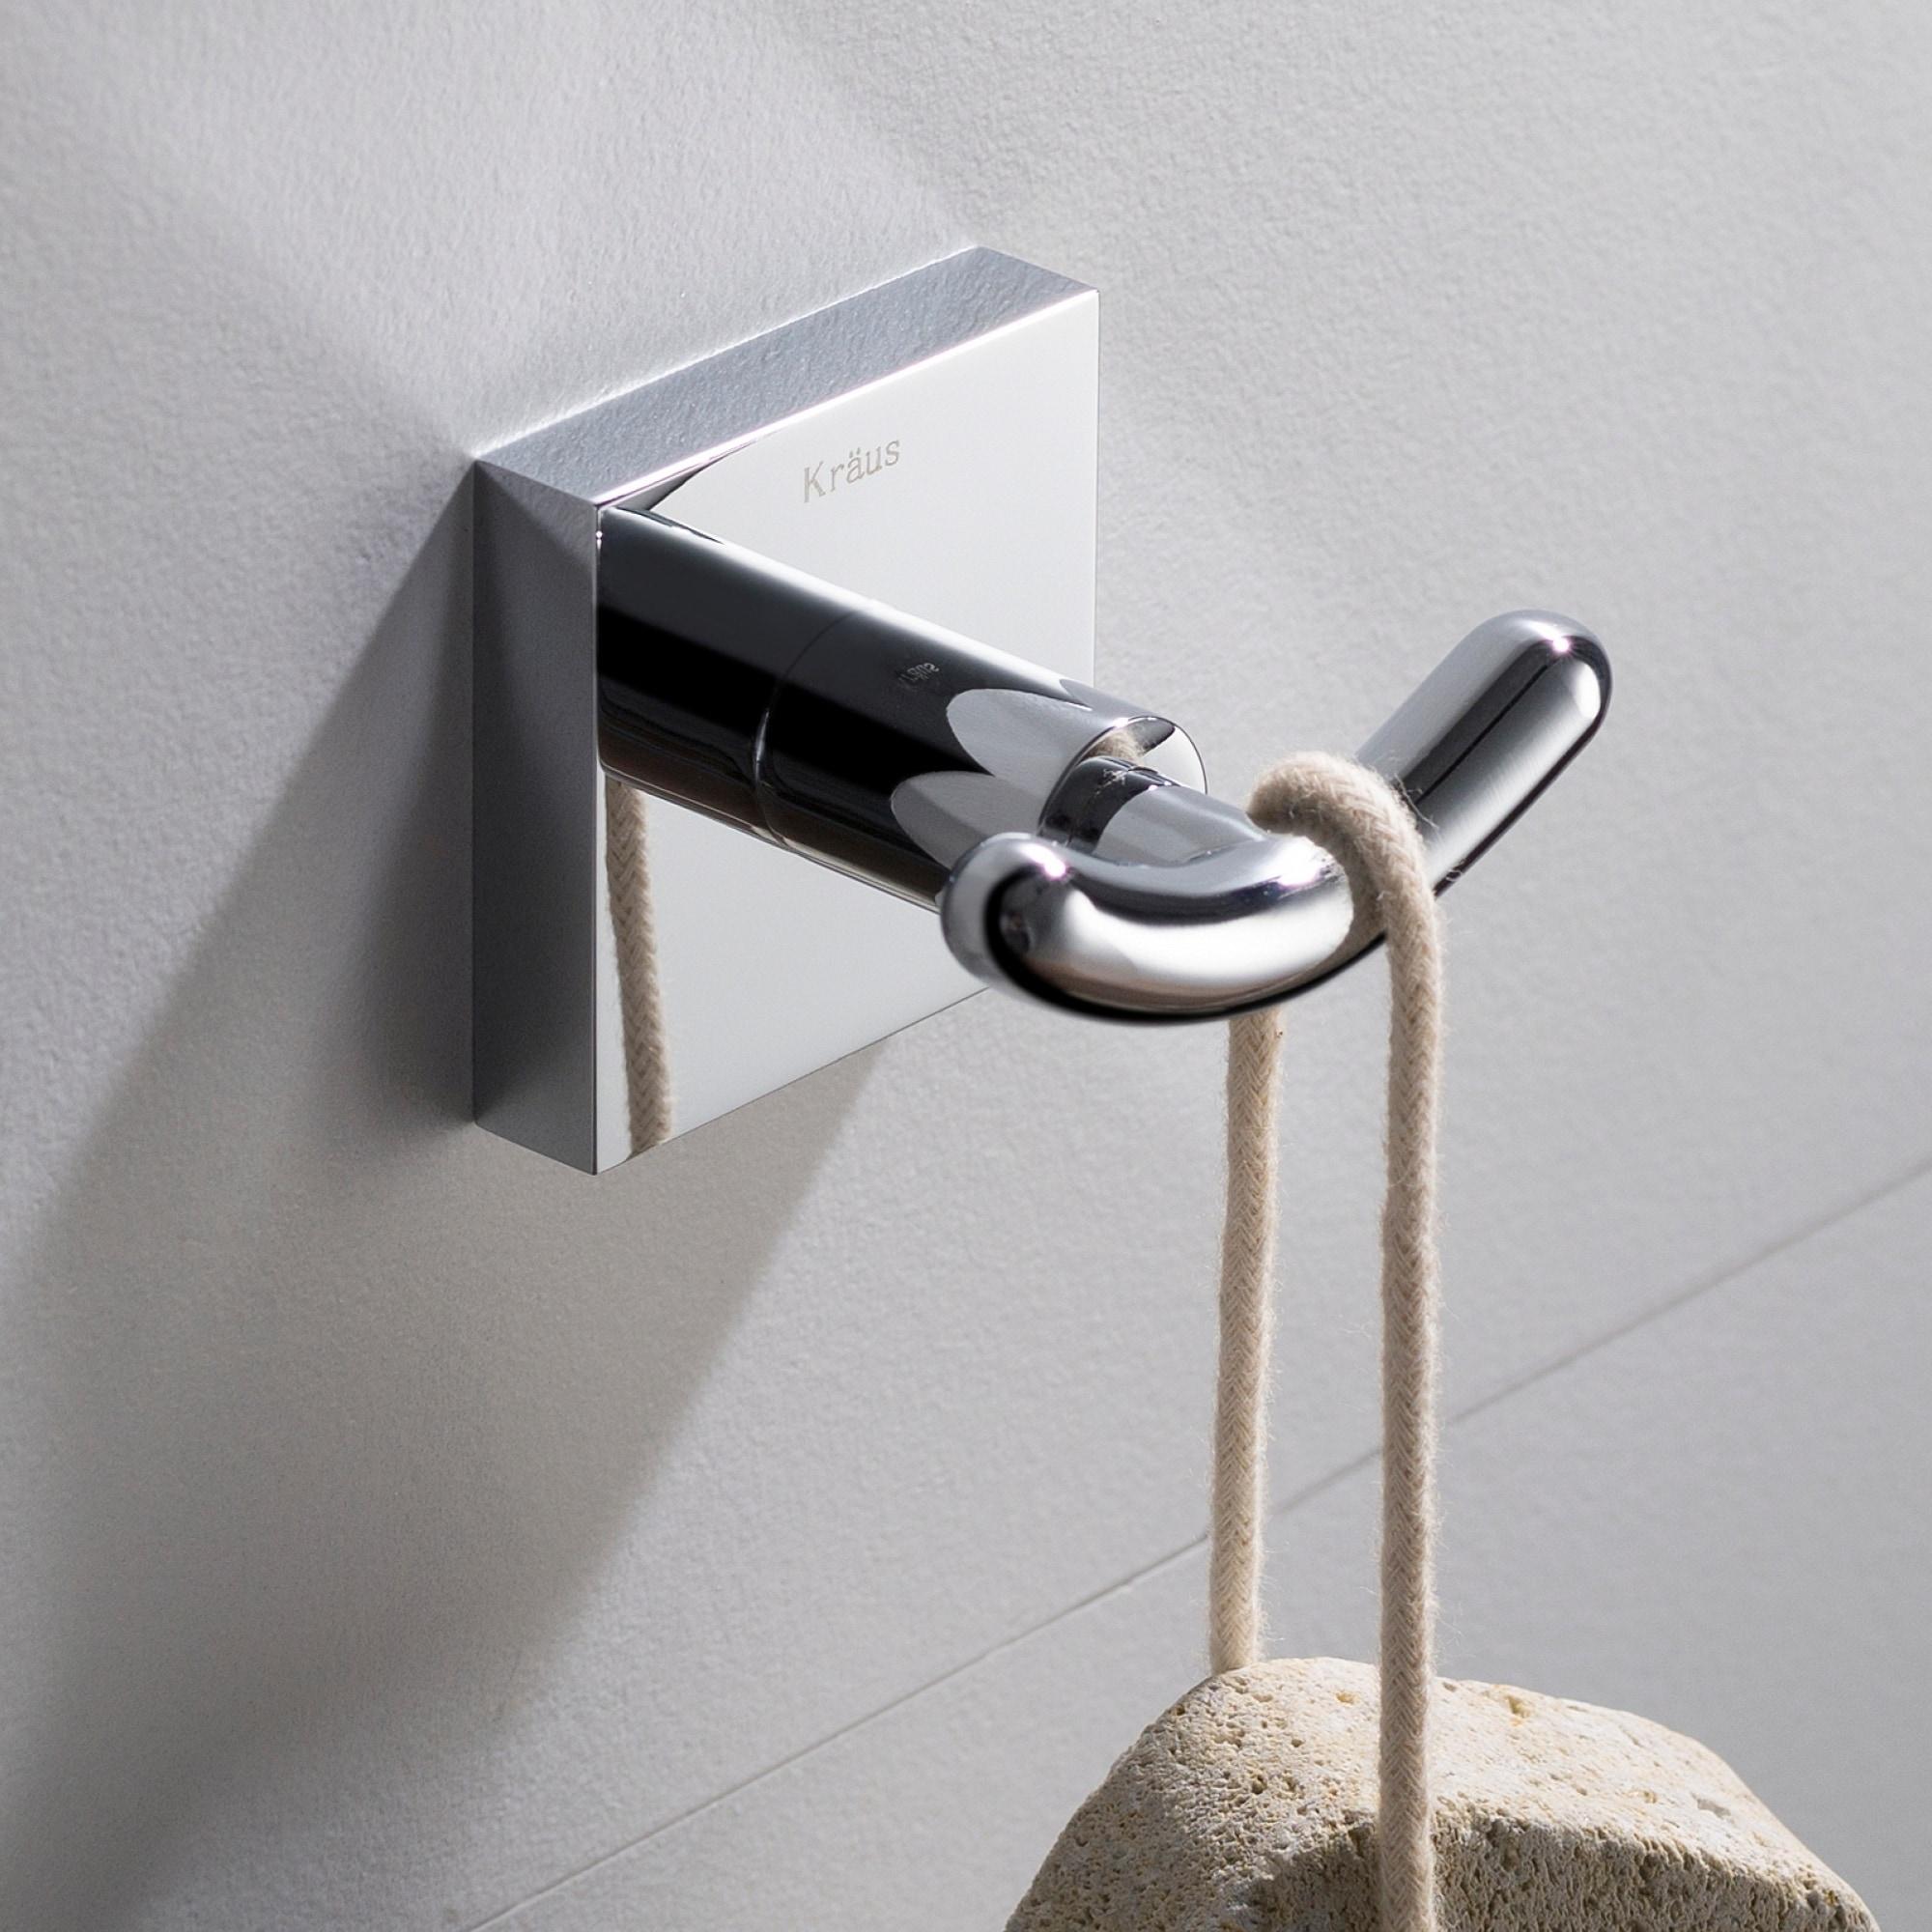 KRAUS Ventus KEA-17702 Bathroom Robe and Towel Double Hook in Chrome, Brushed Nickel, Matte Black Finish